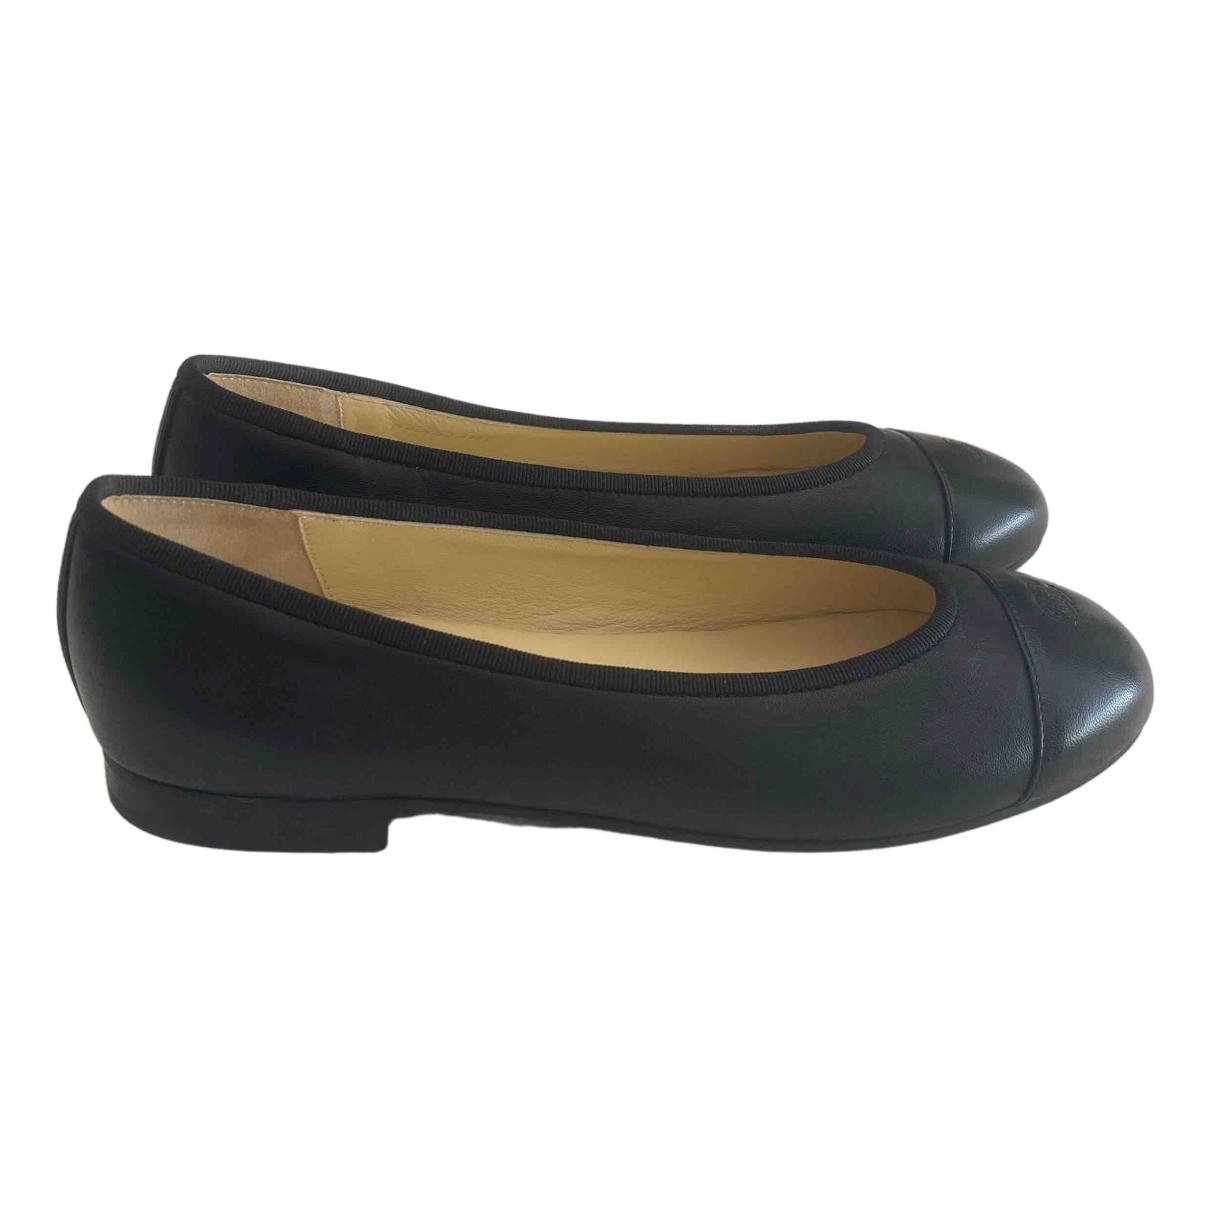 Chanel \N Black Leather Ballet flats for Women 37.5 EU